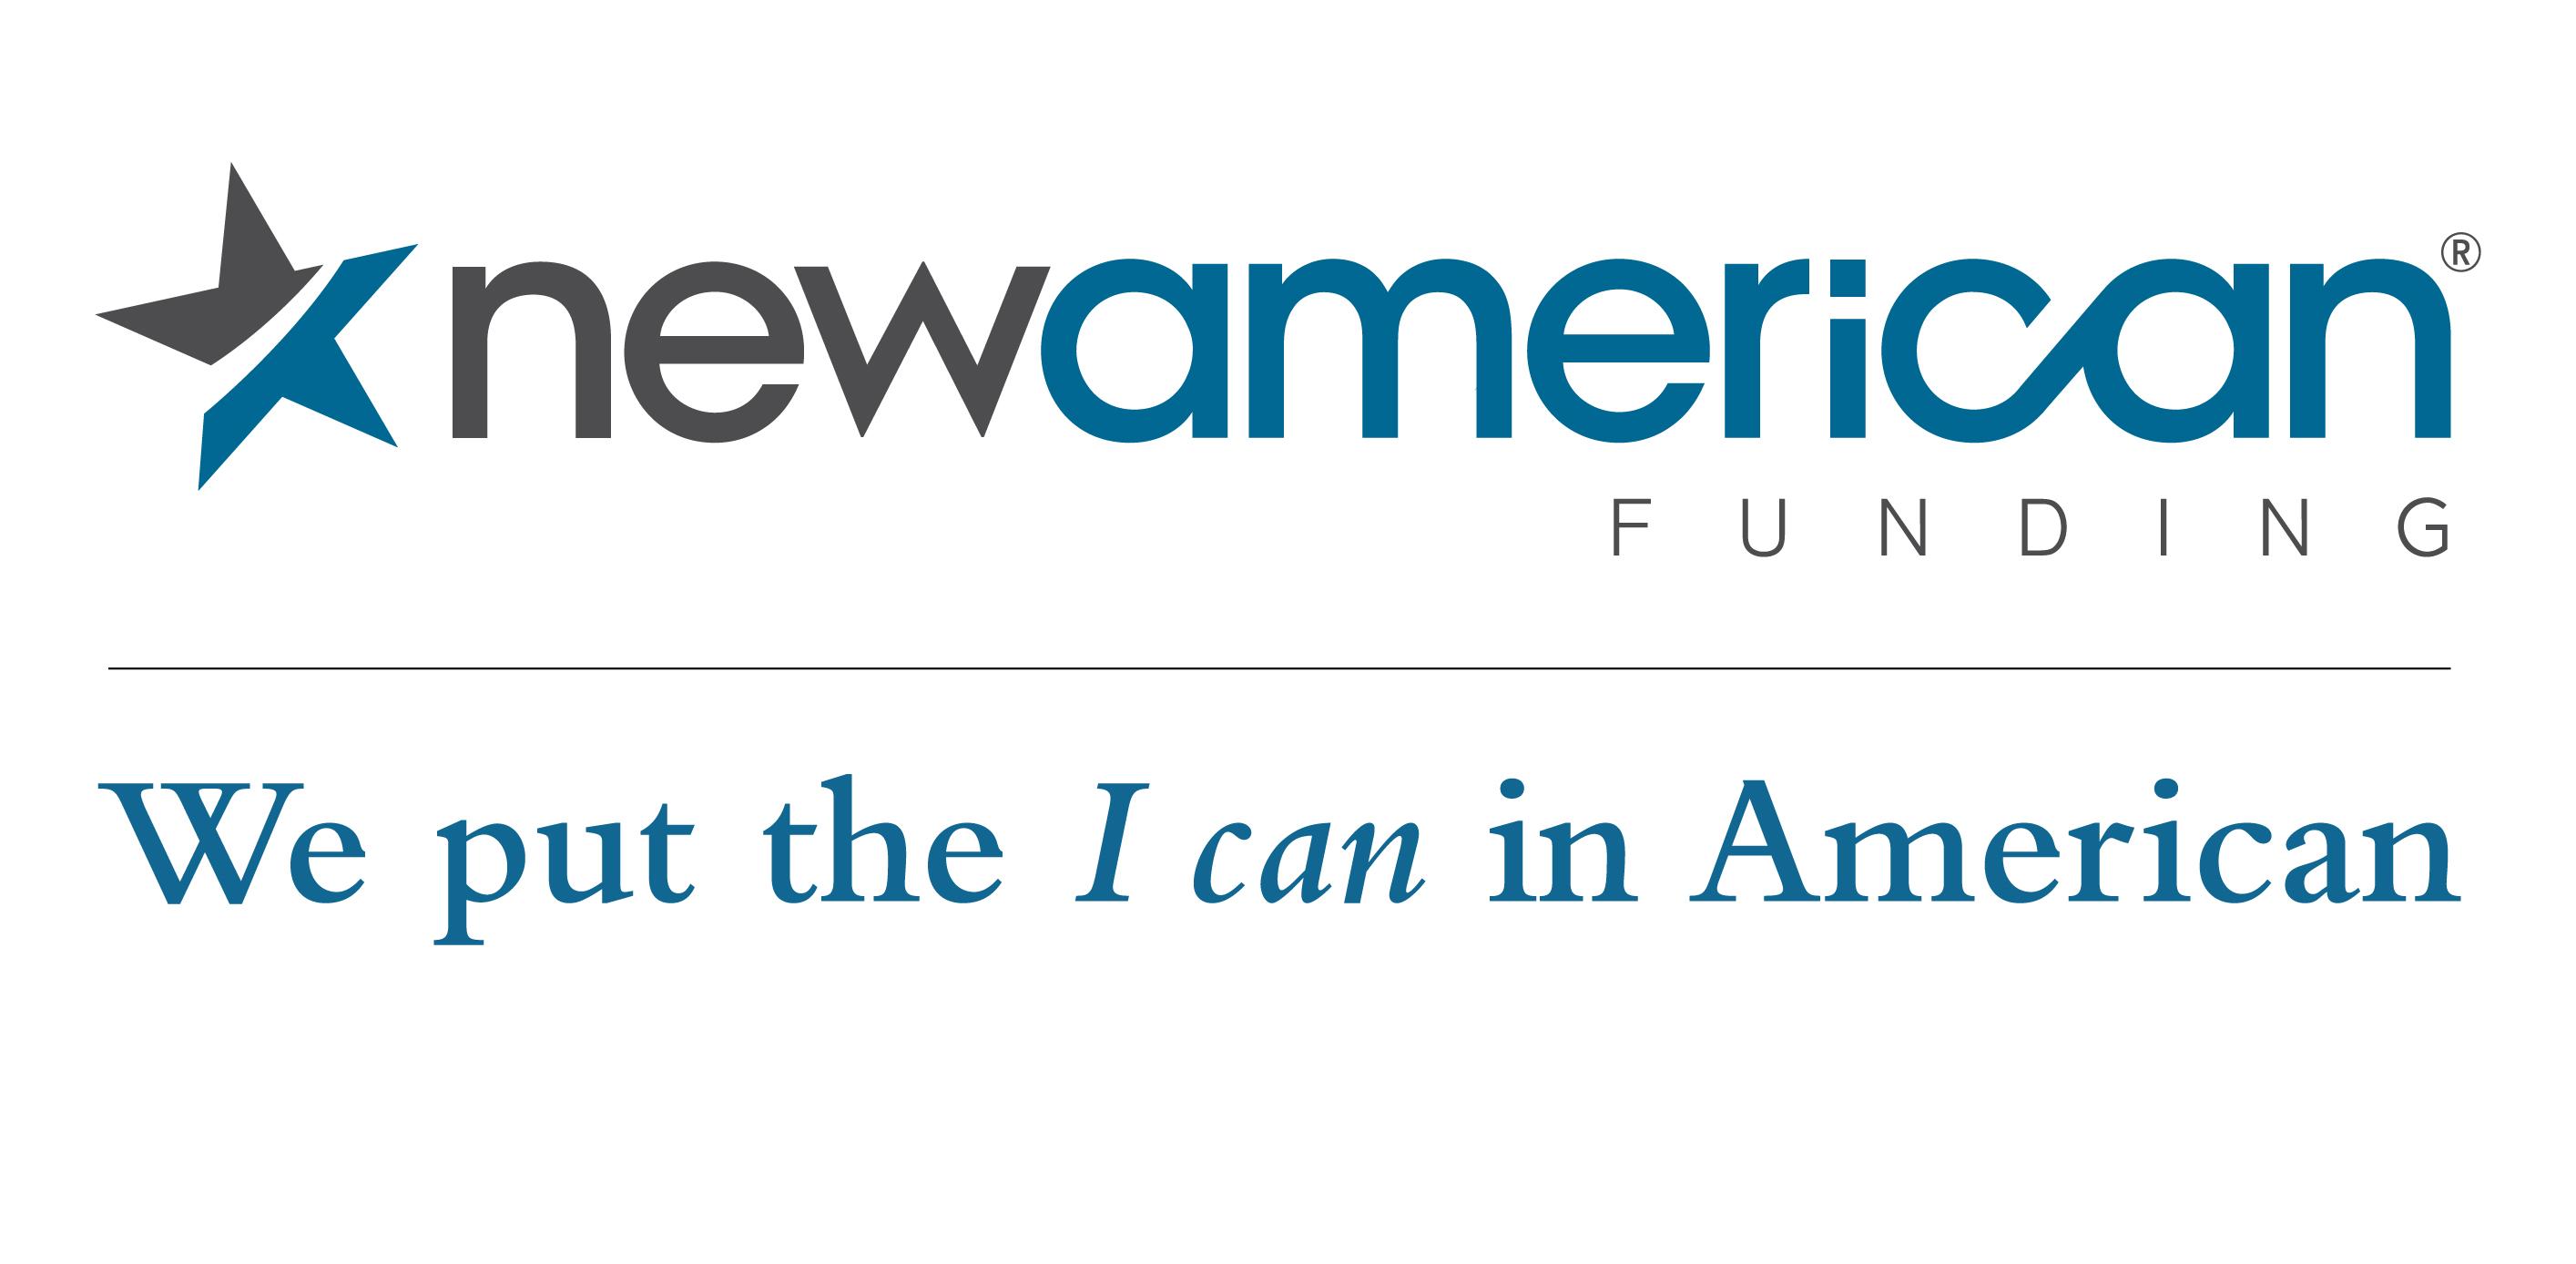 New American Funding Customer Care Net